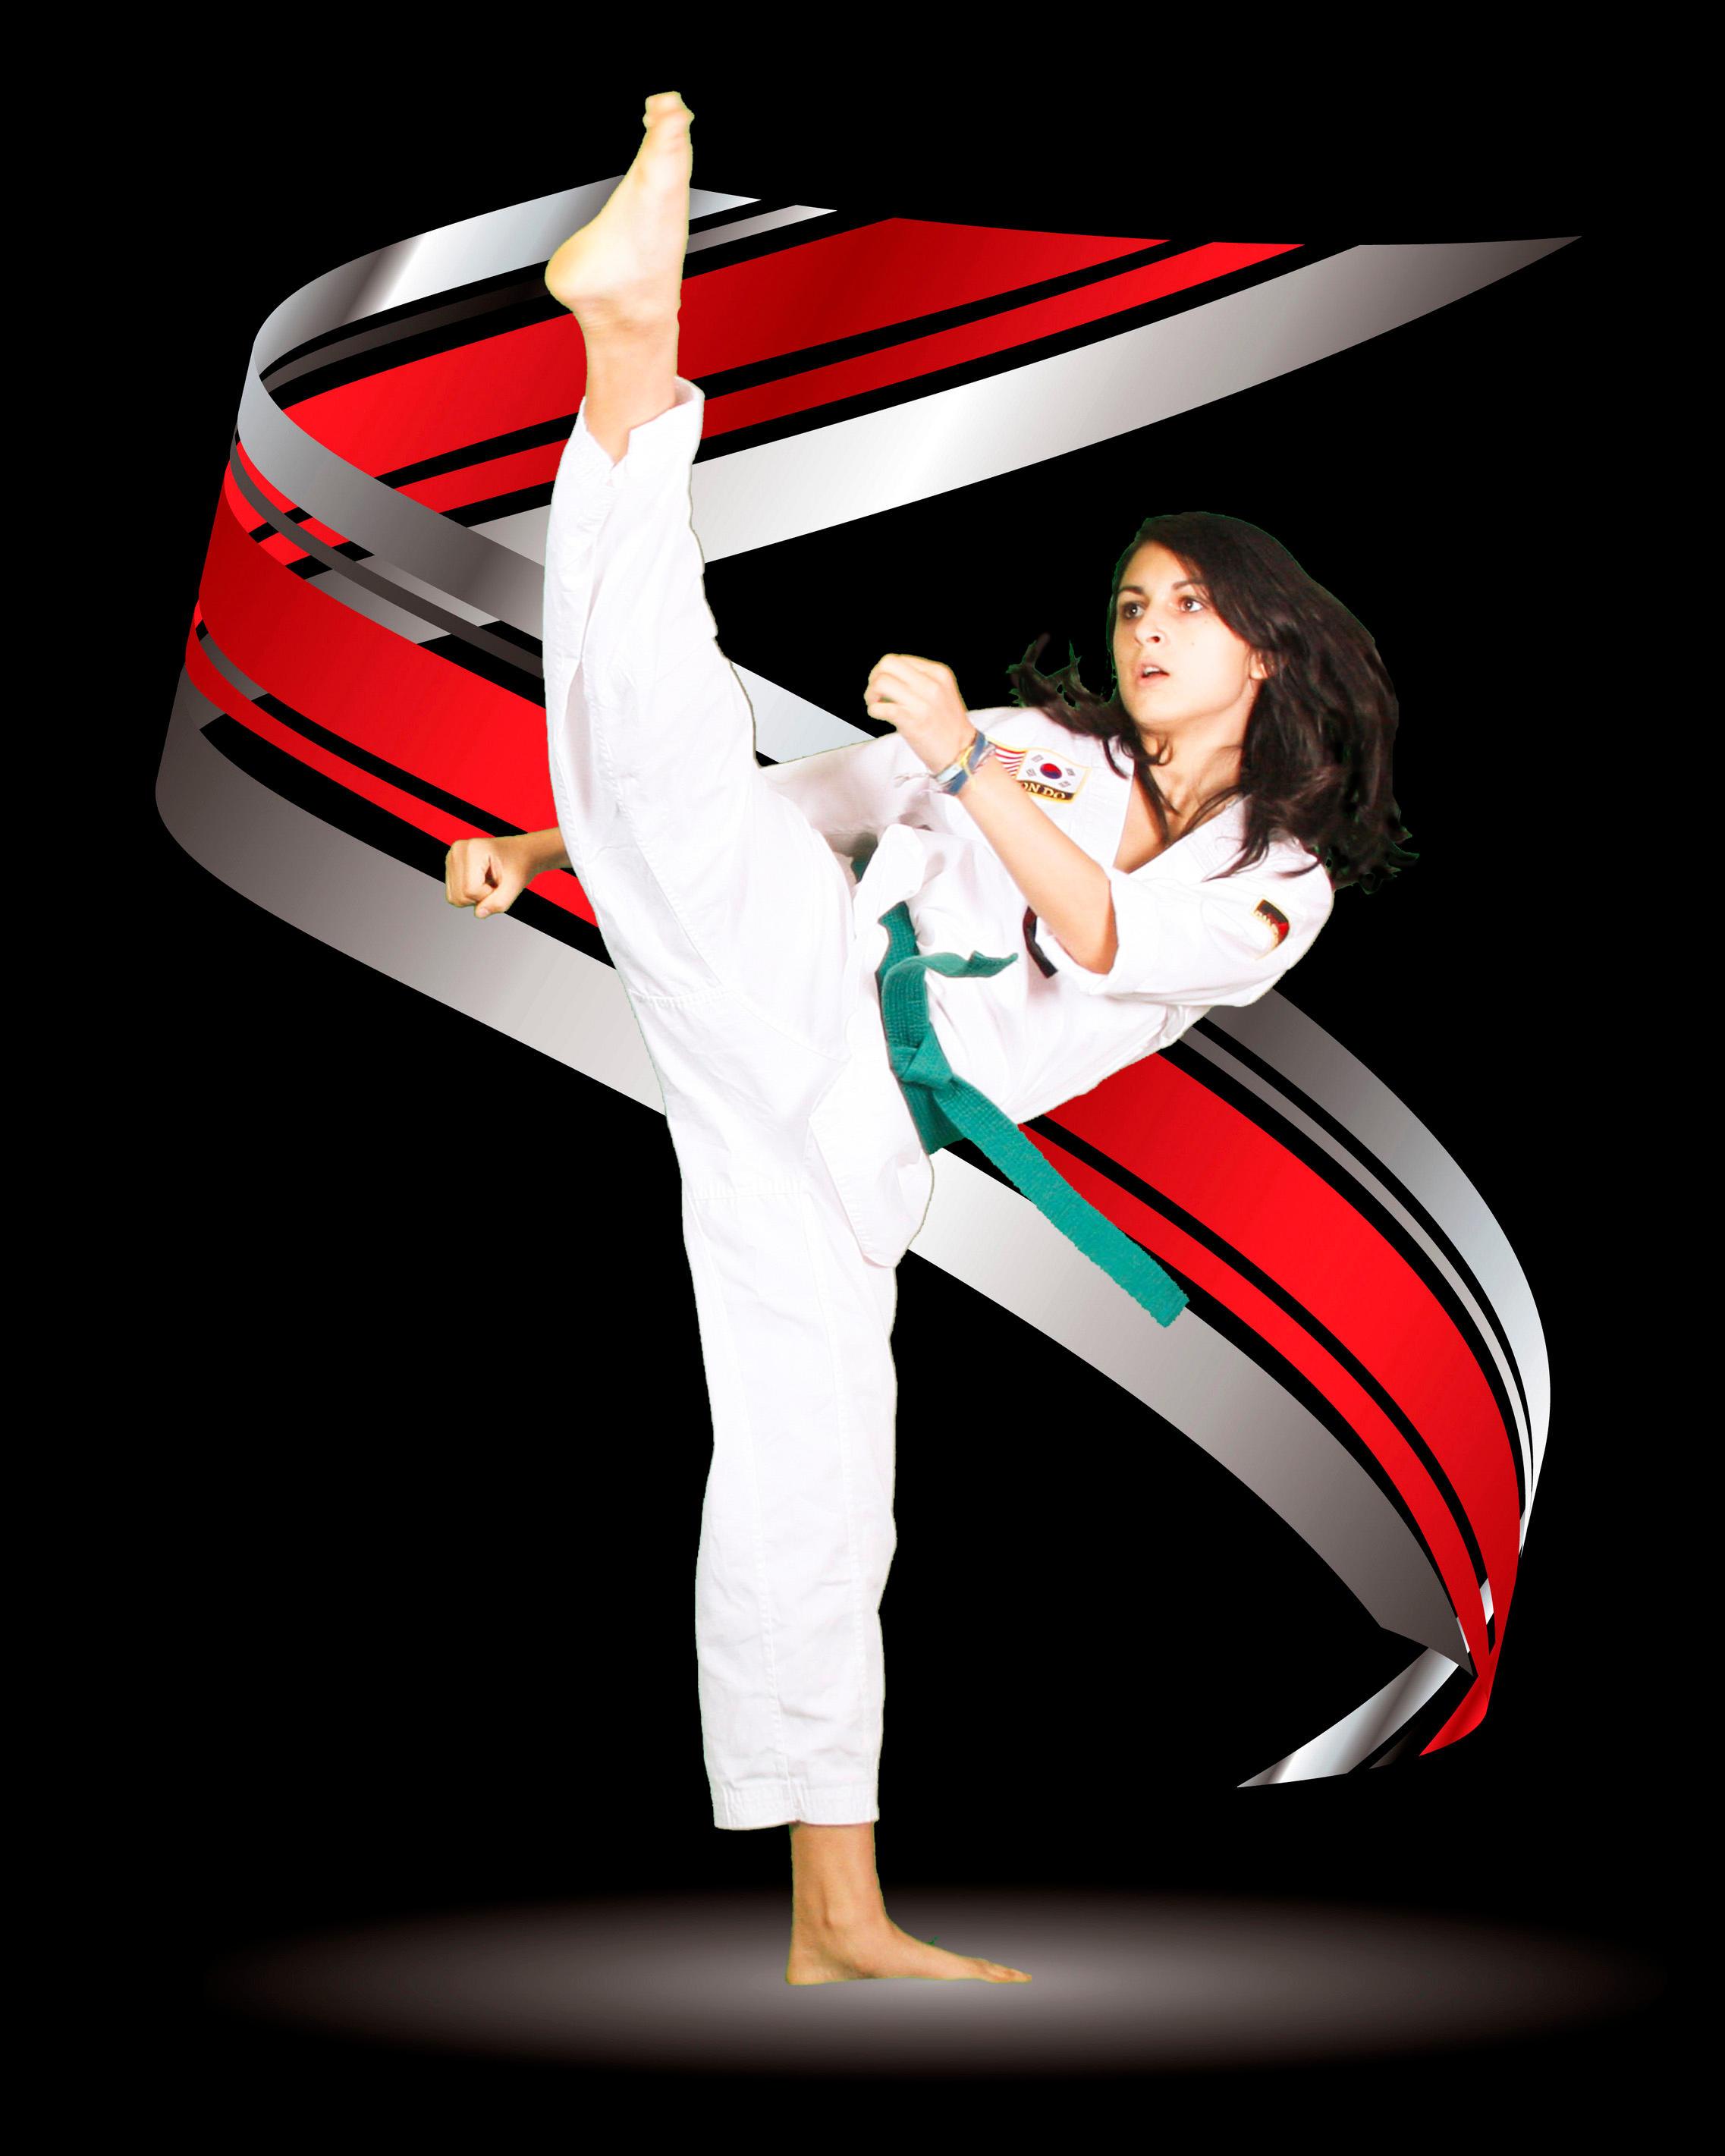 Millennium Martial Arts - Tae Kwon Do image 8